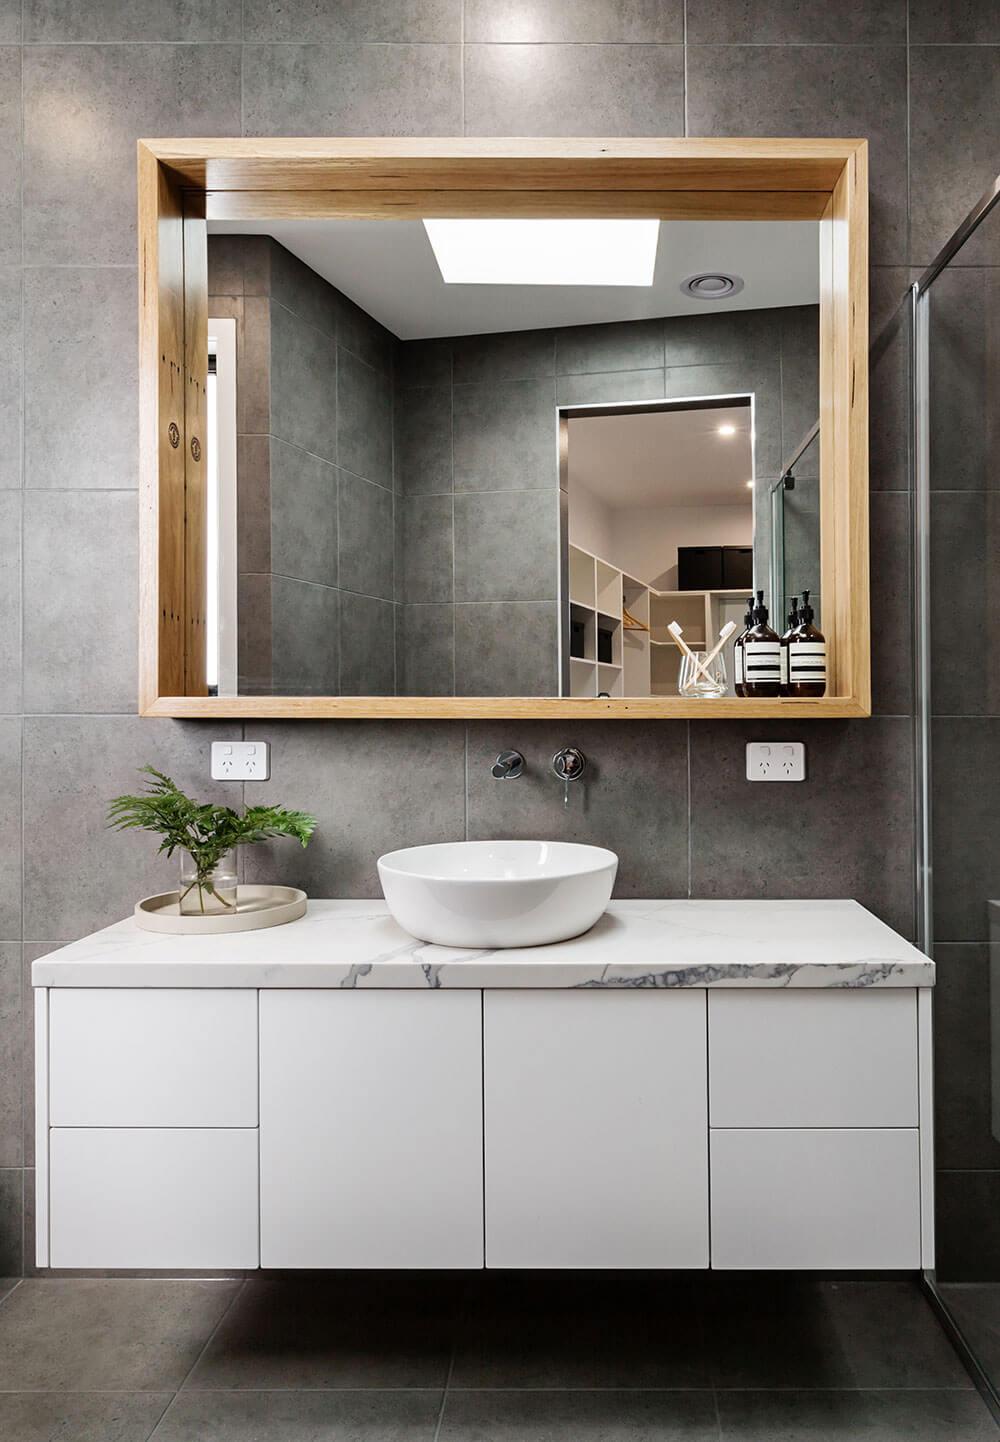 St Kilda main Bathroom renovation